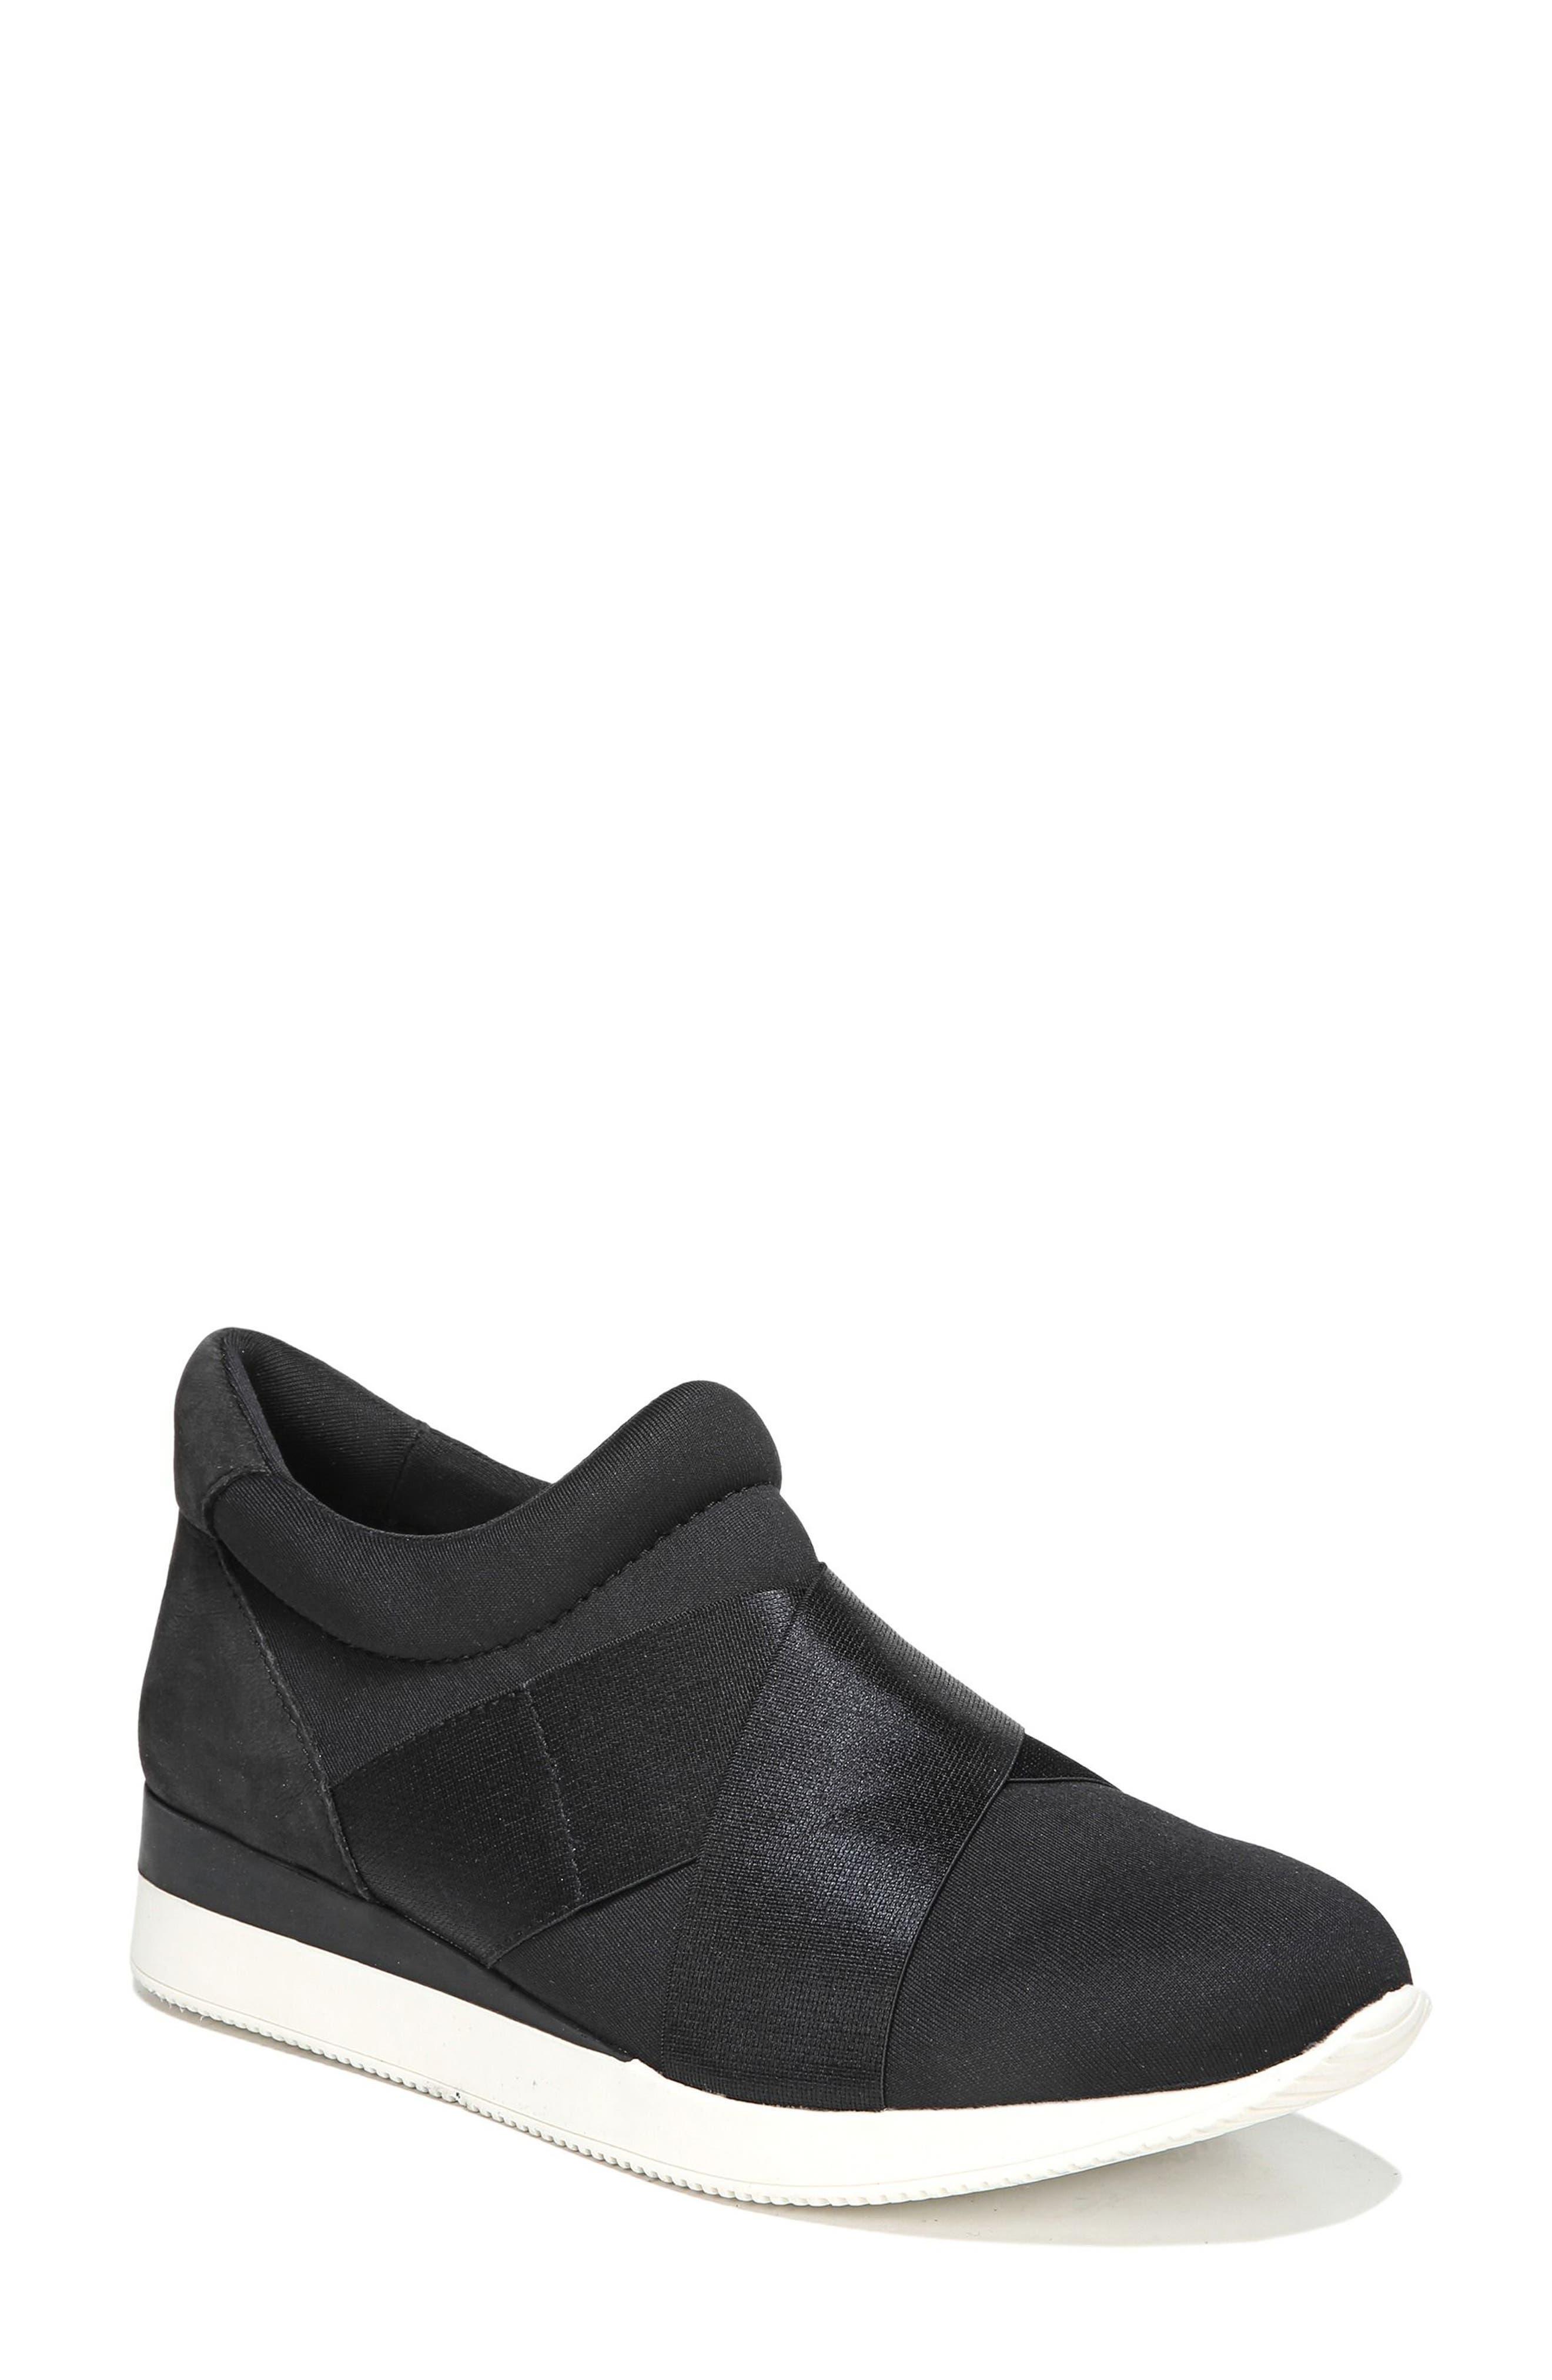 Main Image - Naturalizer Joni Slip-On Sneaker (Women)